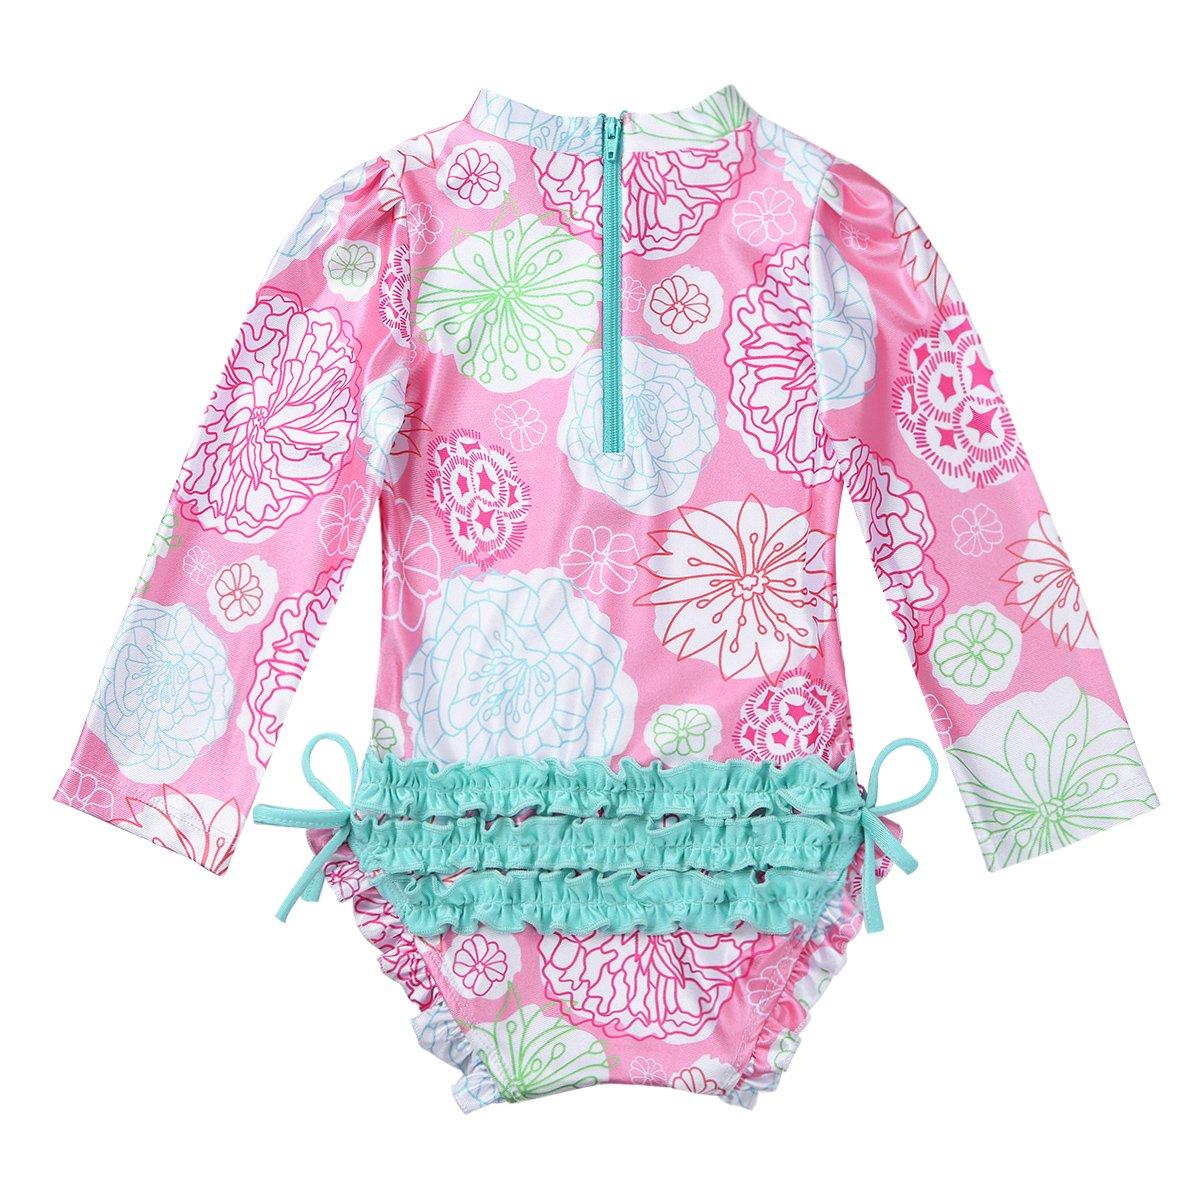 Freebily Baby Girls One Piece Zip Rash Guard Swimsuit Vest UV Sun Protection Suit Swimwear Wetsuit UPF 50+